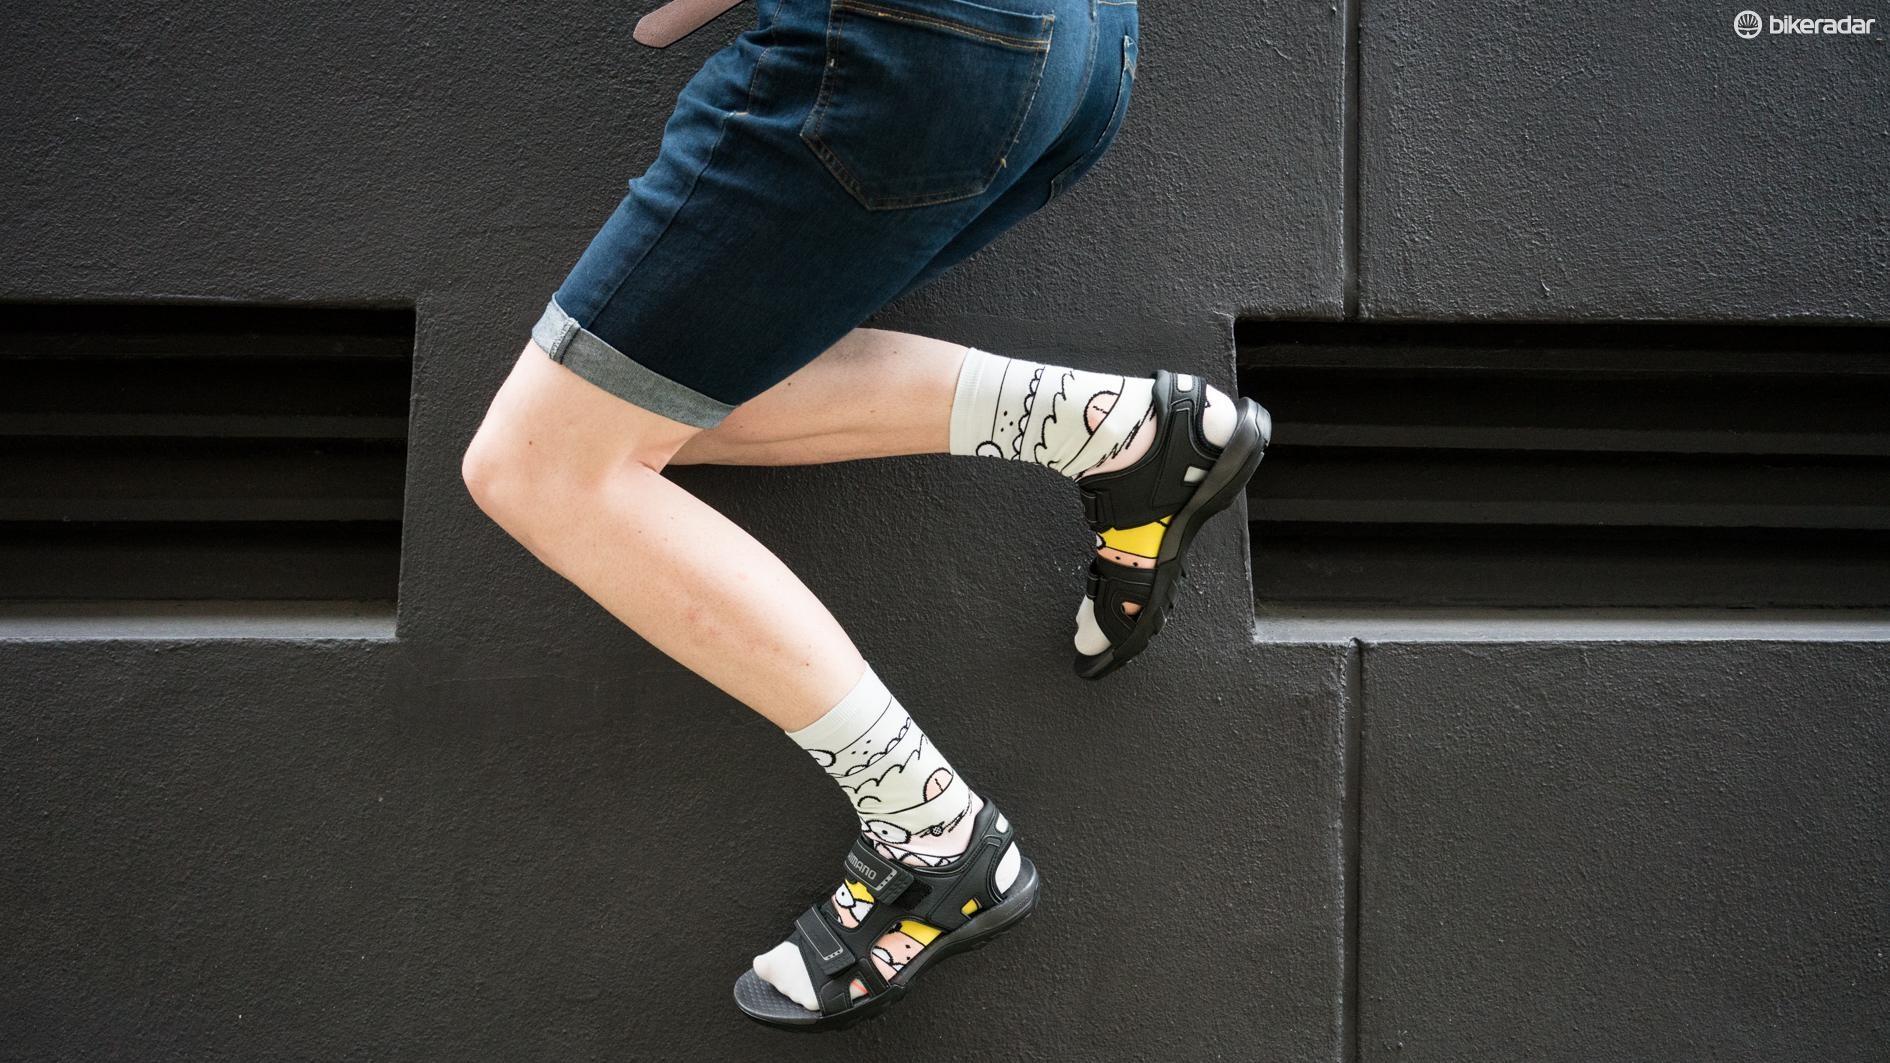 The sandals are also parkour compatible